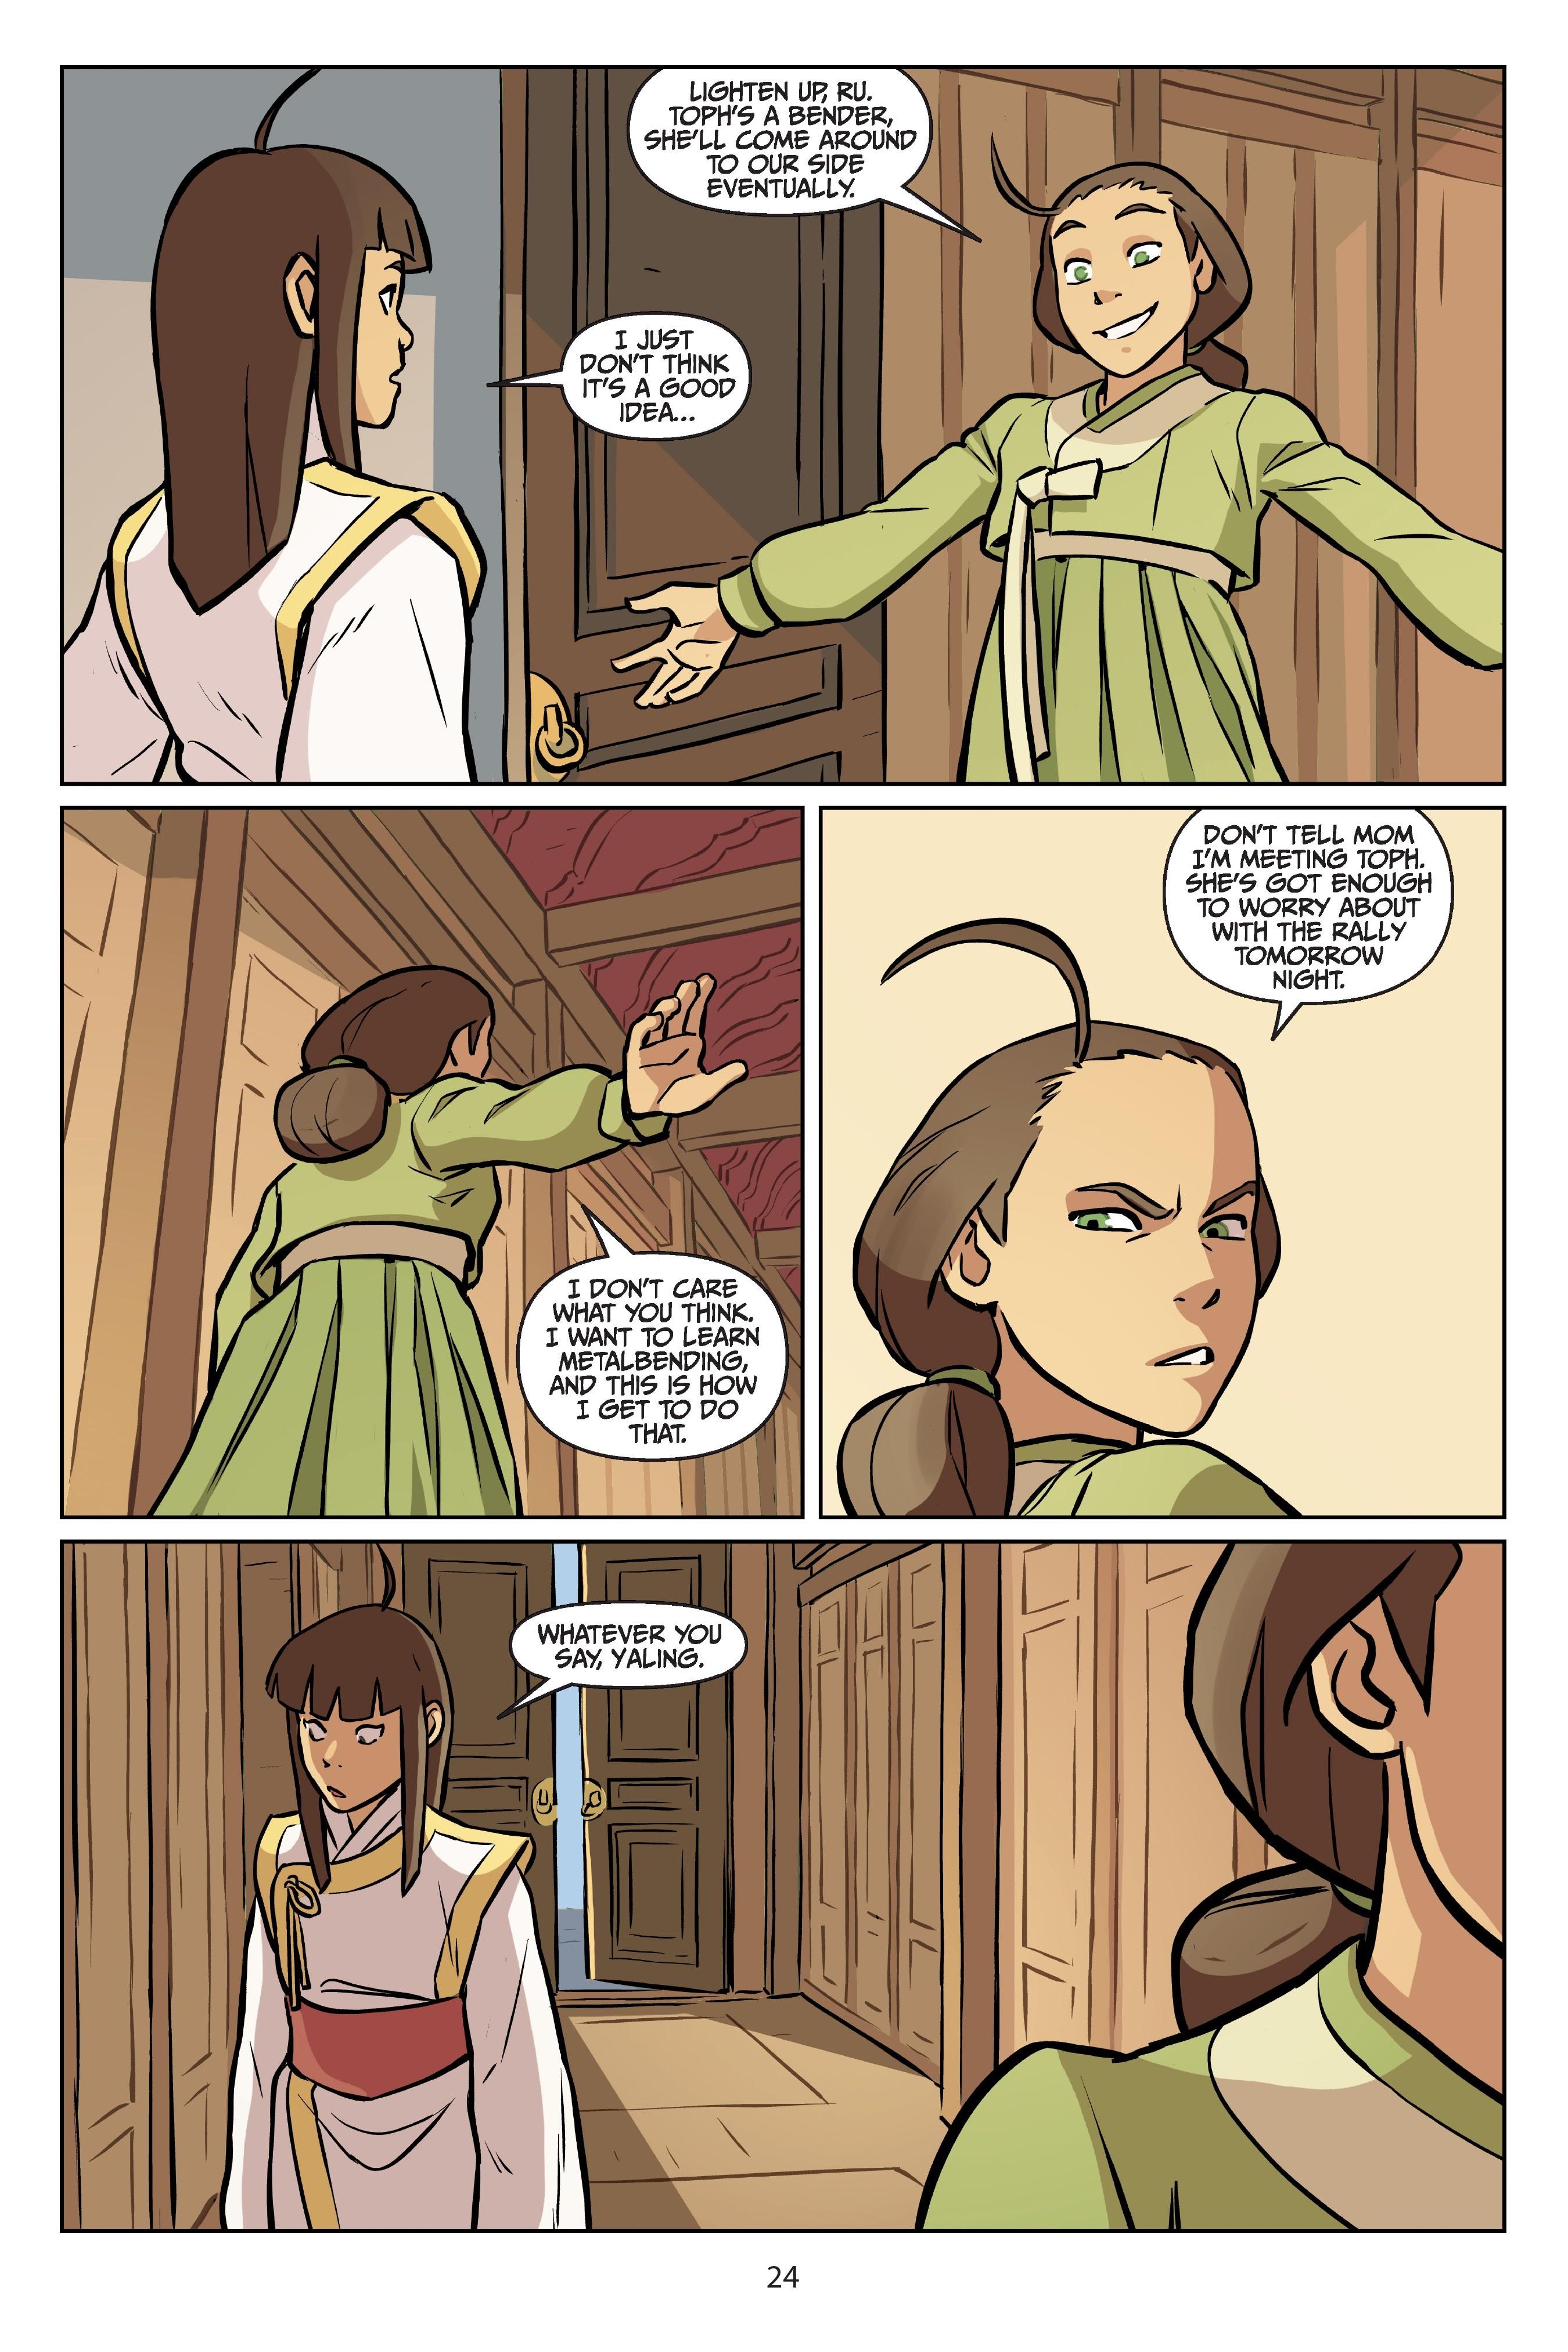 Nickelodeon Avatar: The Last Airbender - Imbalance TPB_2 Page 24